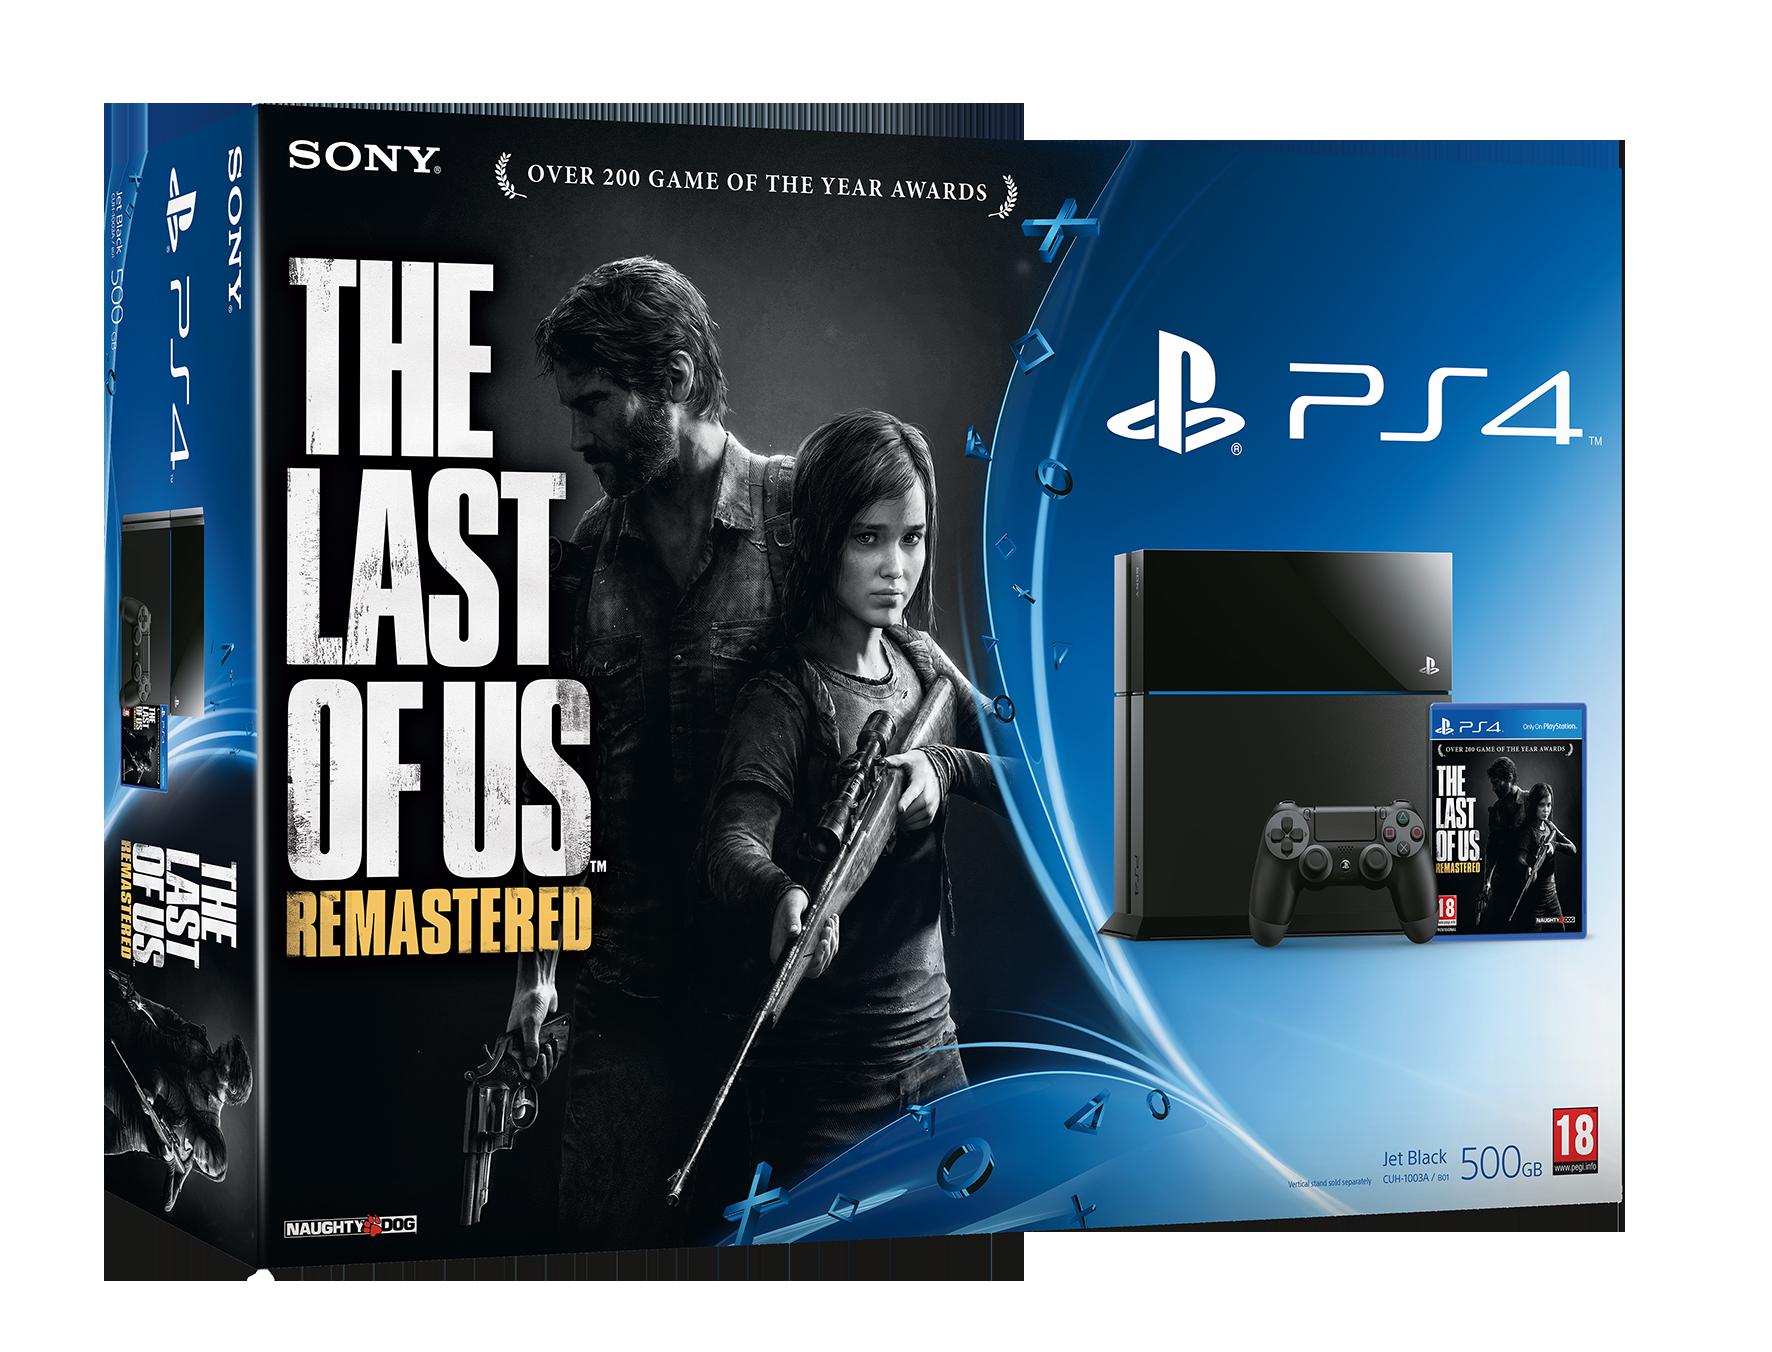 PS4 The Last of Us Remasterd bundle